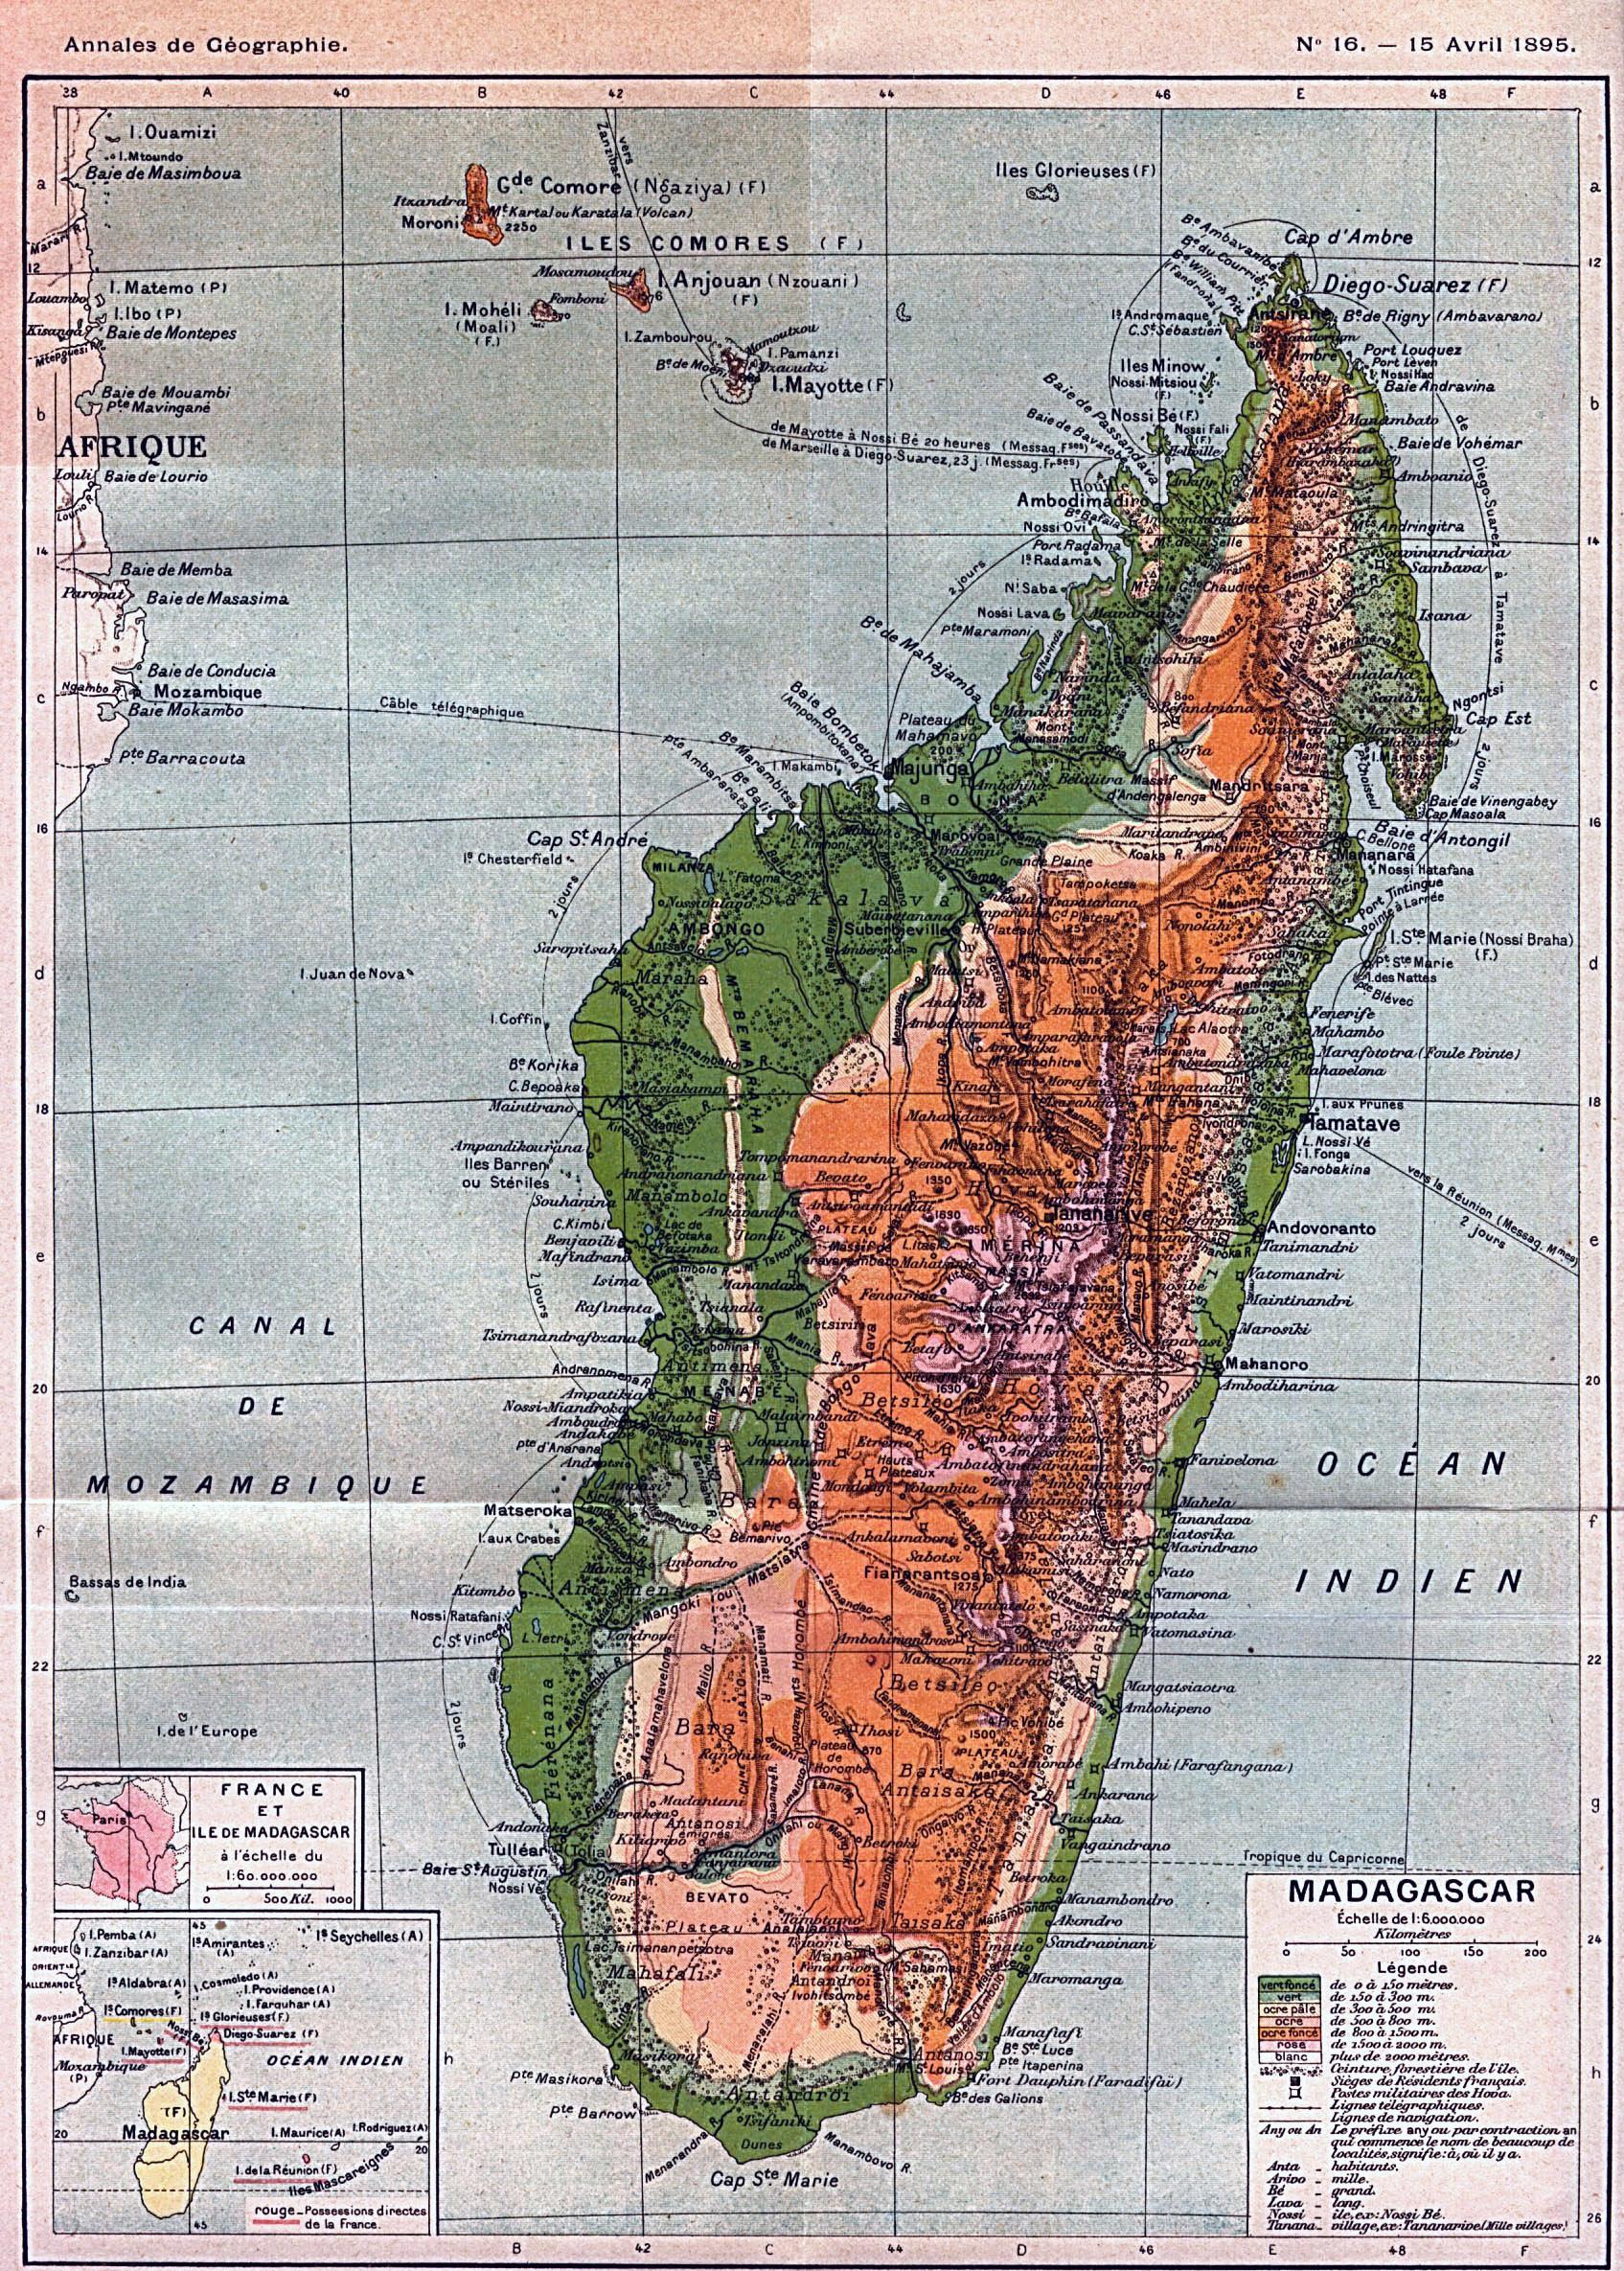 Africa Physical Map Madagascar.Large Detailed Old Physical Map Of Madagascar 1895